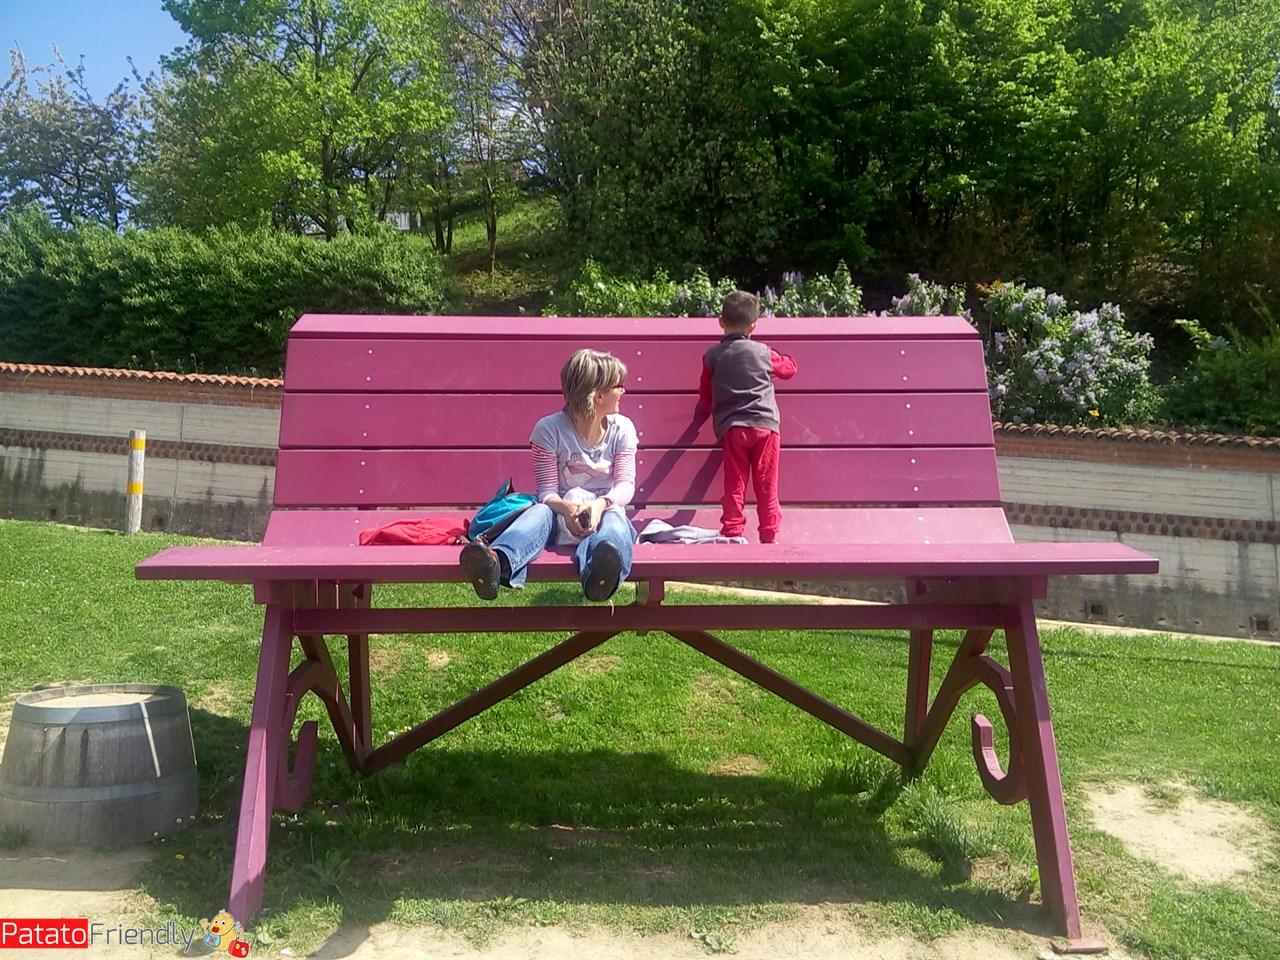 La panchina gigante di Monforte d'Alba